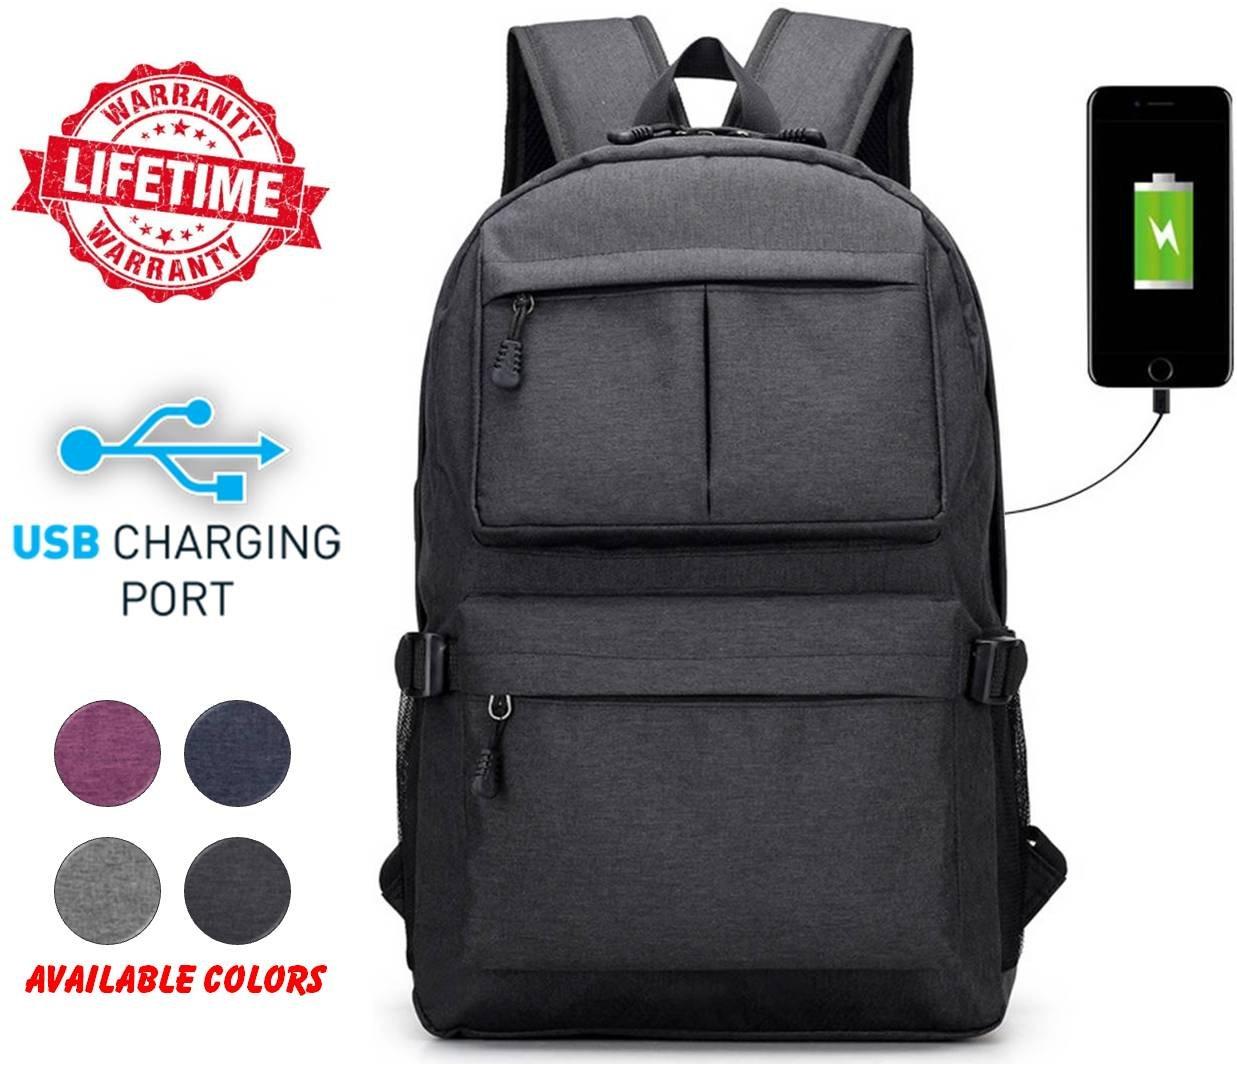 High School College Unisex Outdoor Heavy Duty Laptop Backpack Bag Charging USB Port Running, Hiking, Sports, Jungle, Camping, Cycling & Fishing, Men & Women (Black)